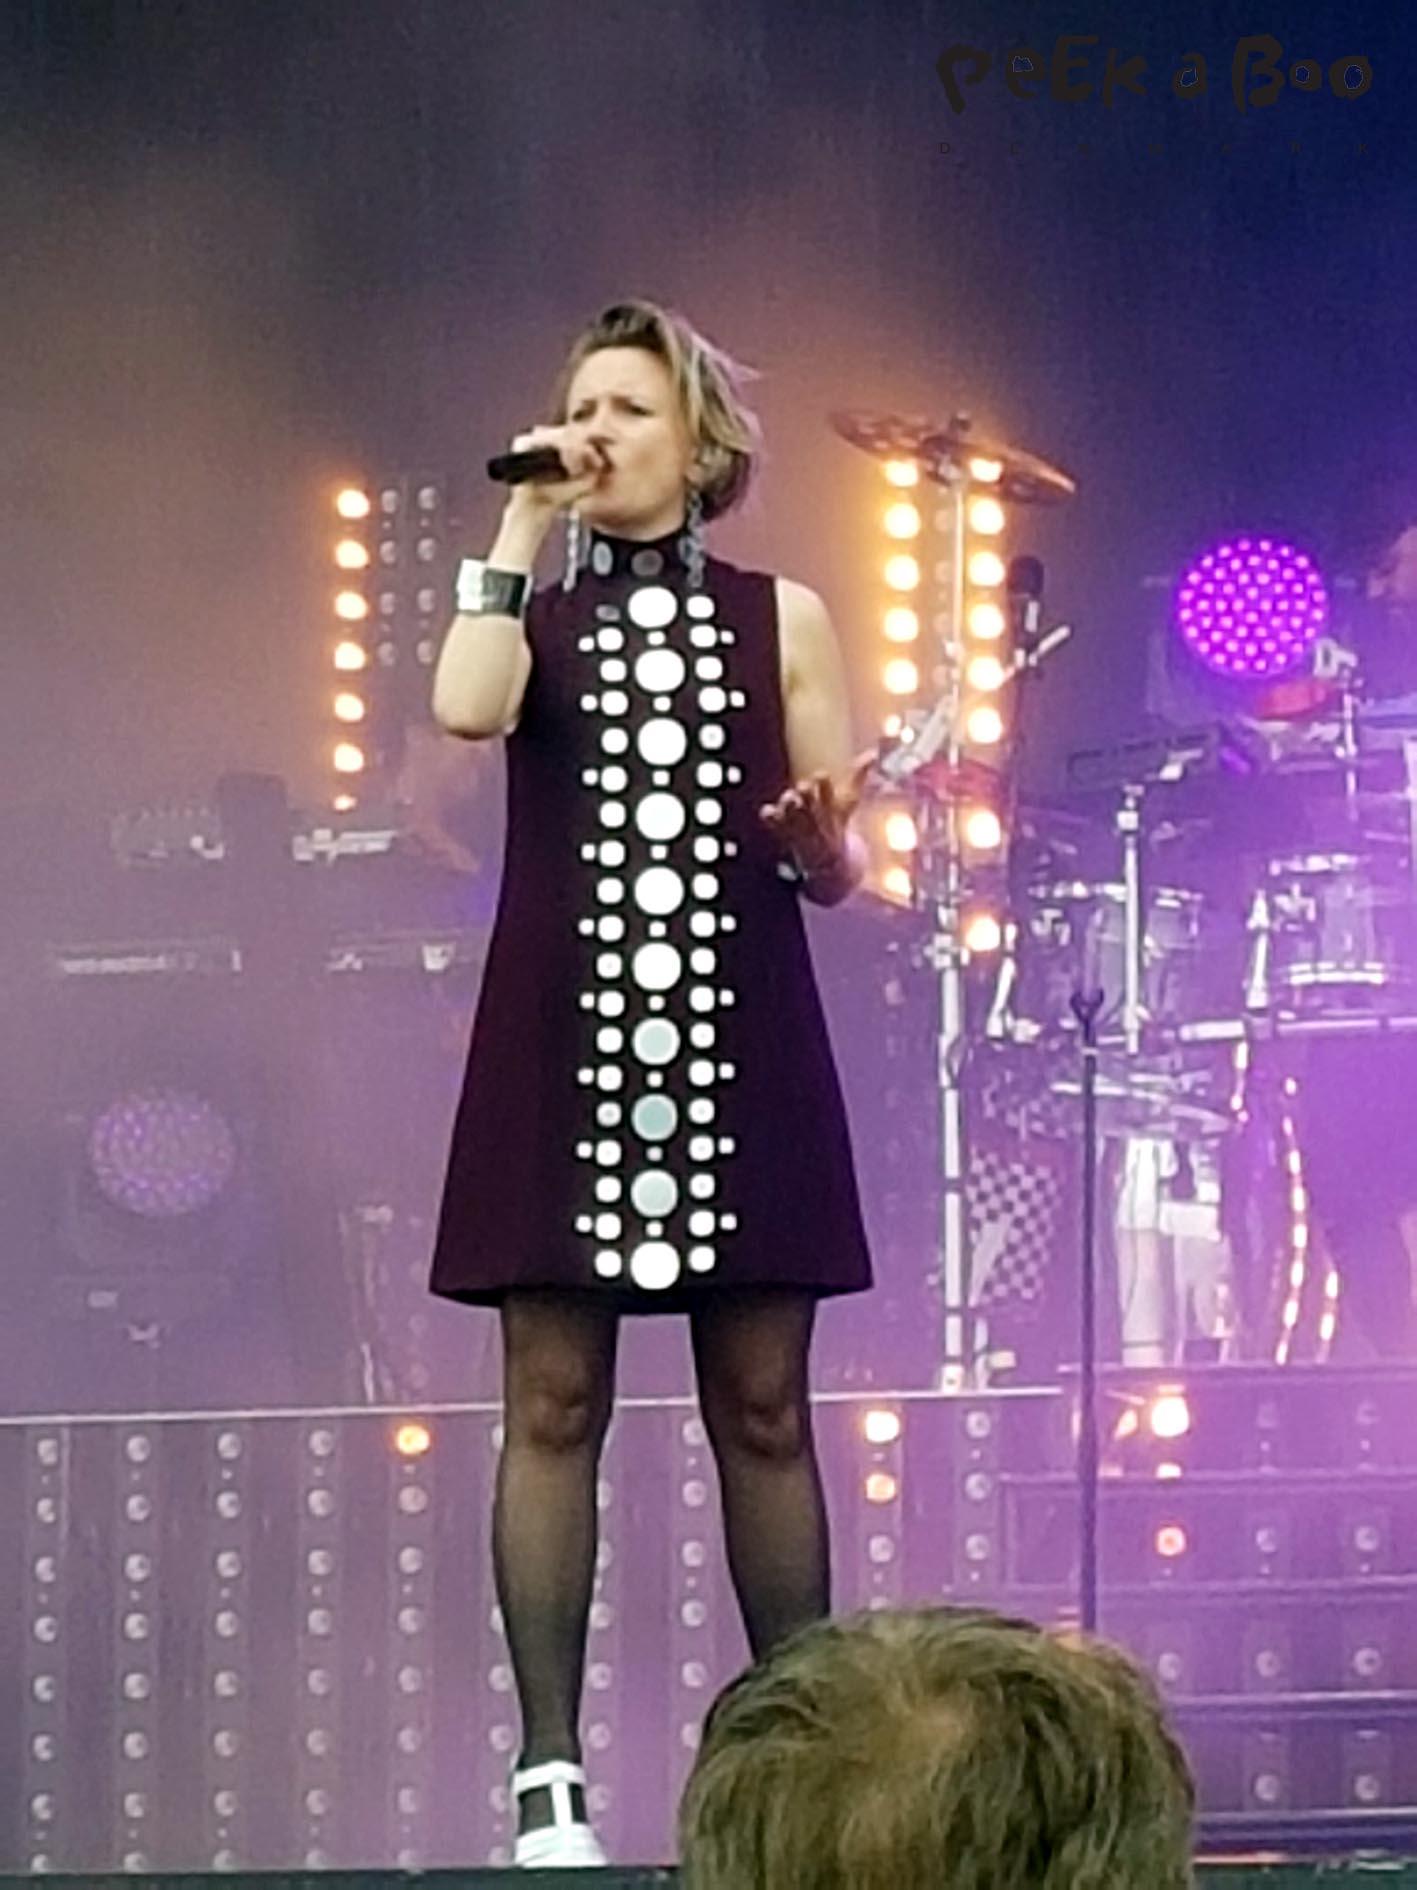 Stine Bramsen at Vig Festival 2016.